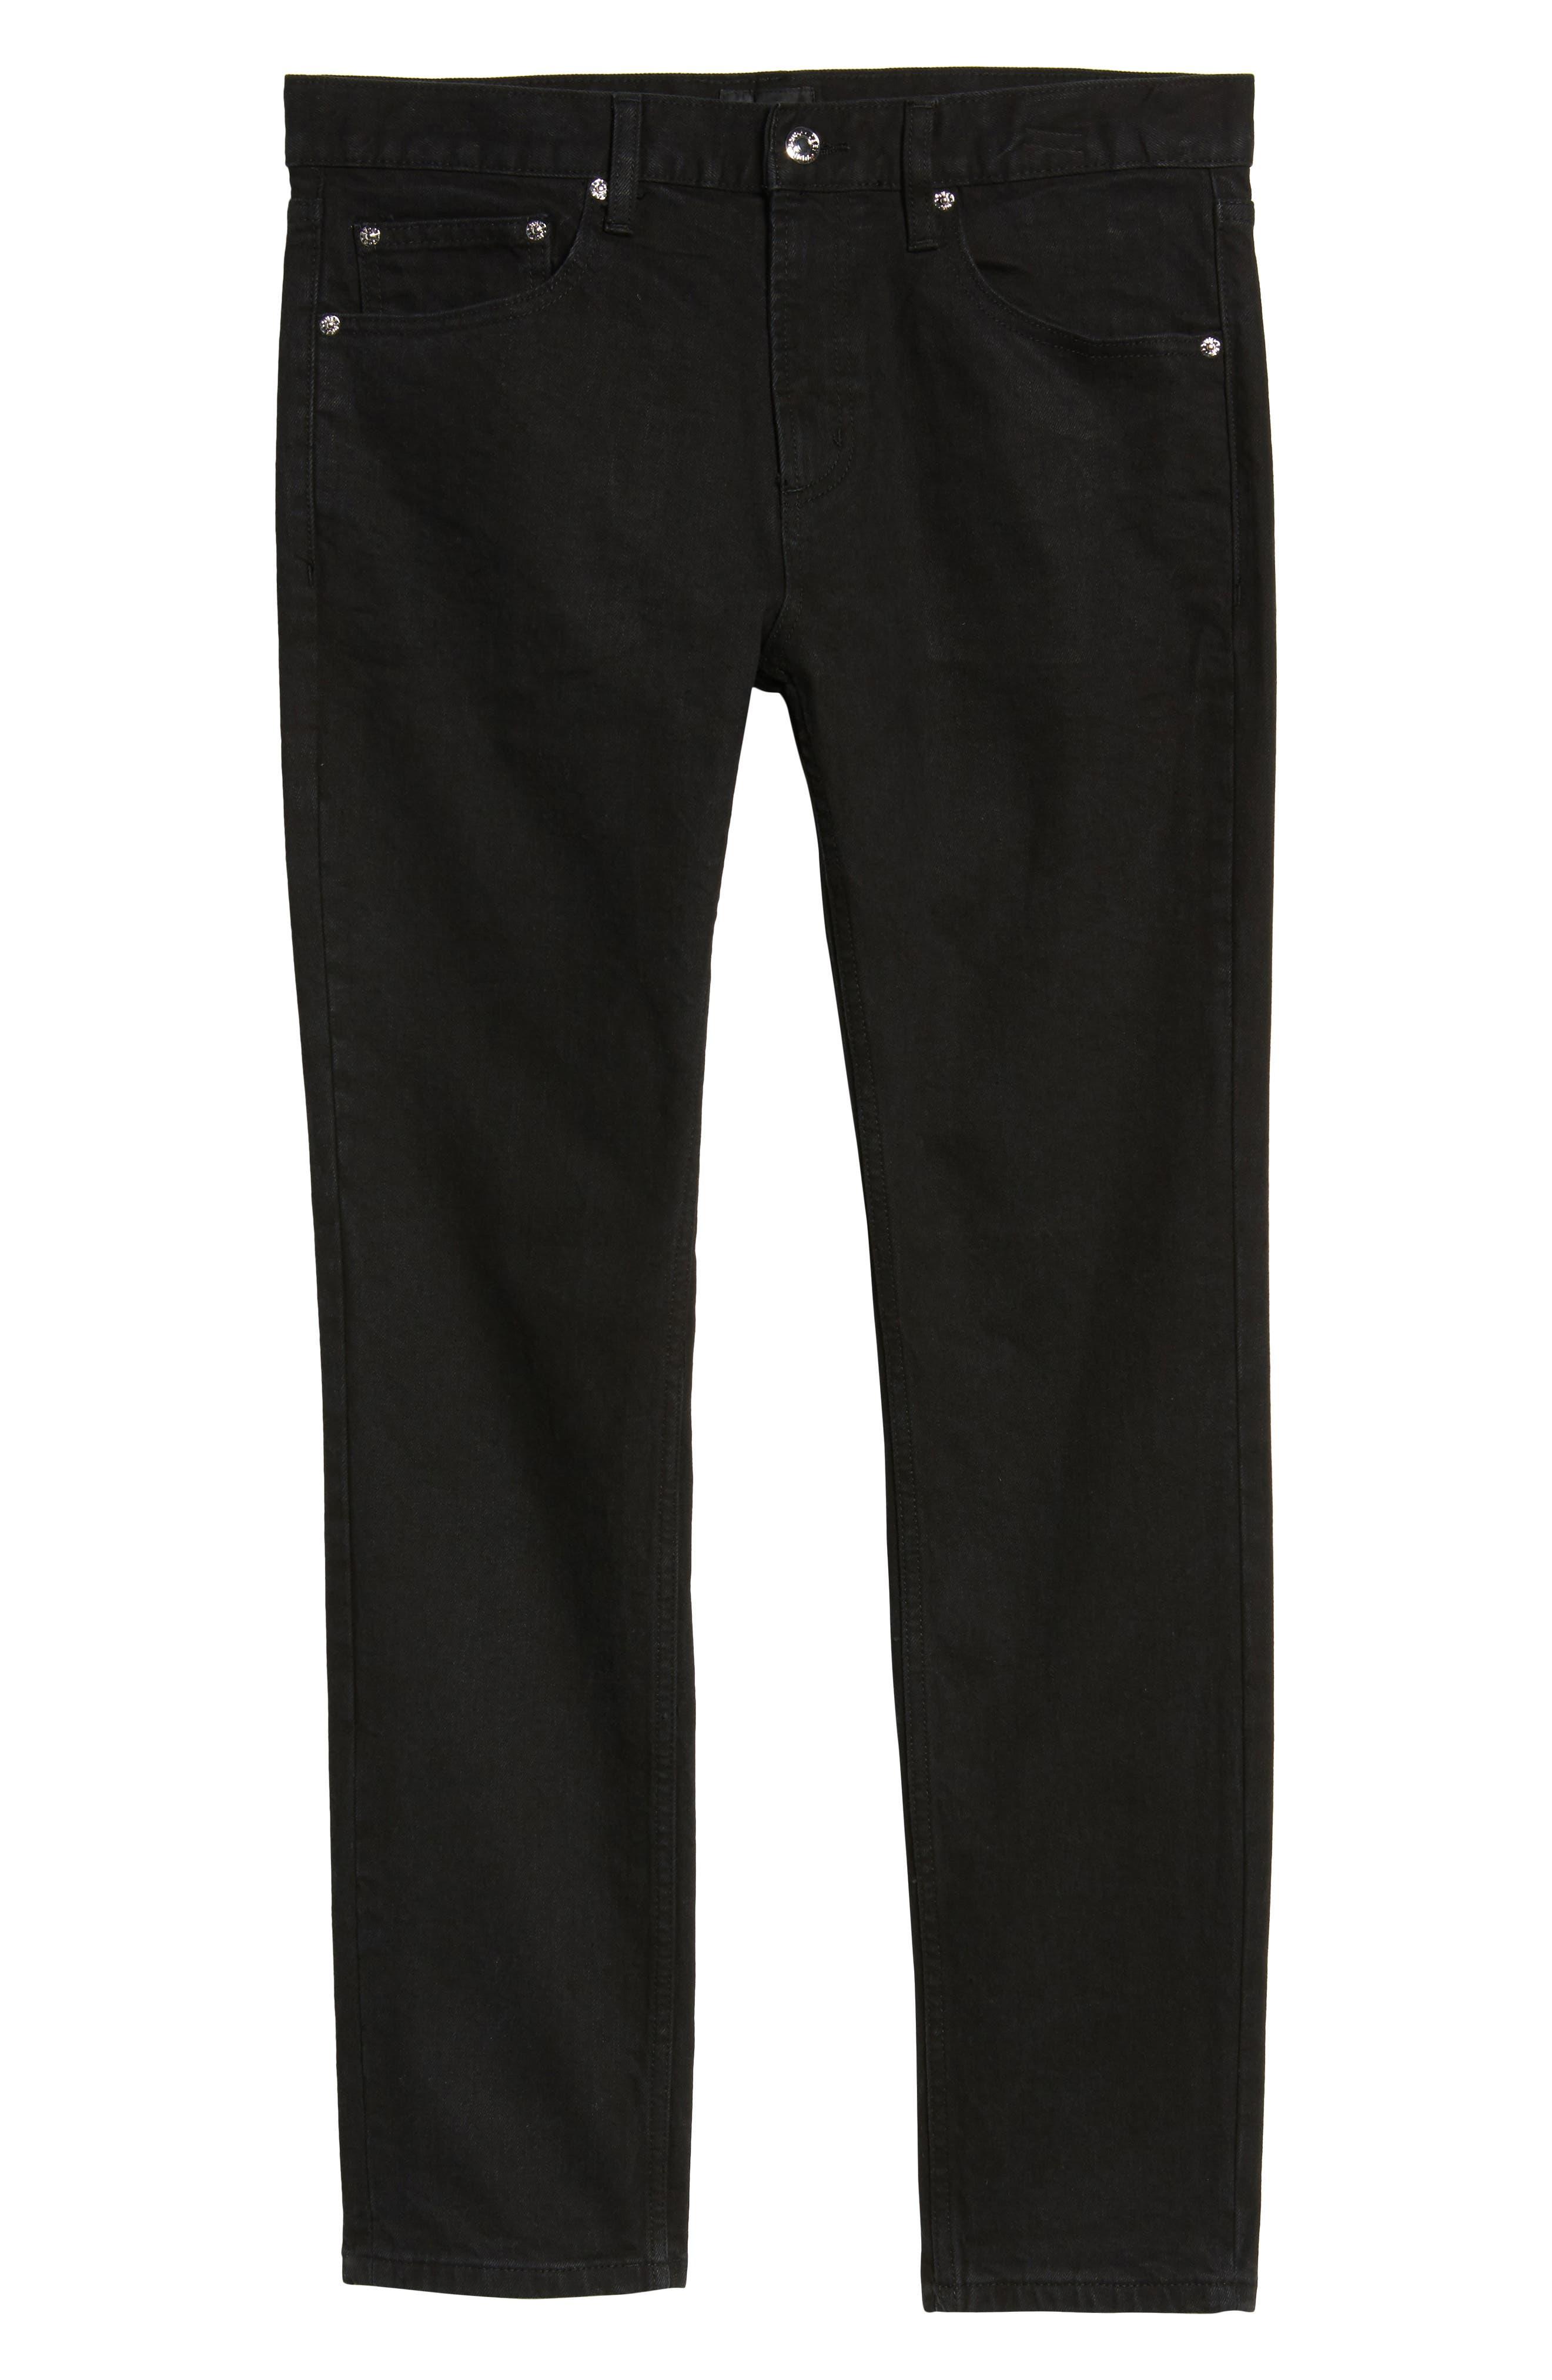 Juvee II Skinny Fit Jeans,                             Alternate thumbnail 6, color,                             Black